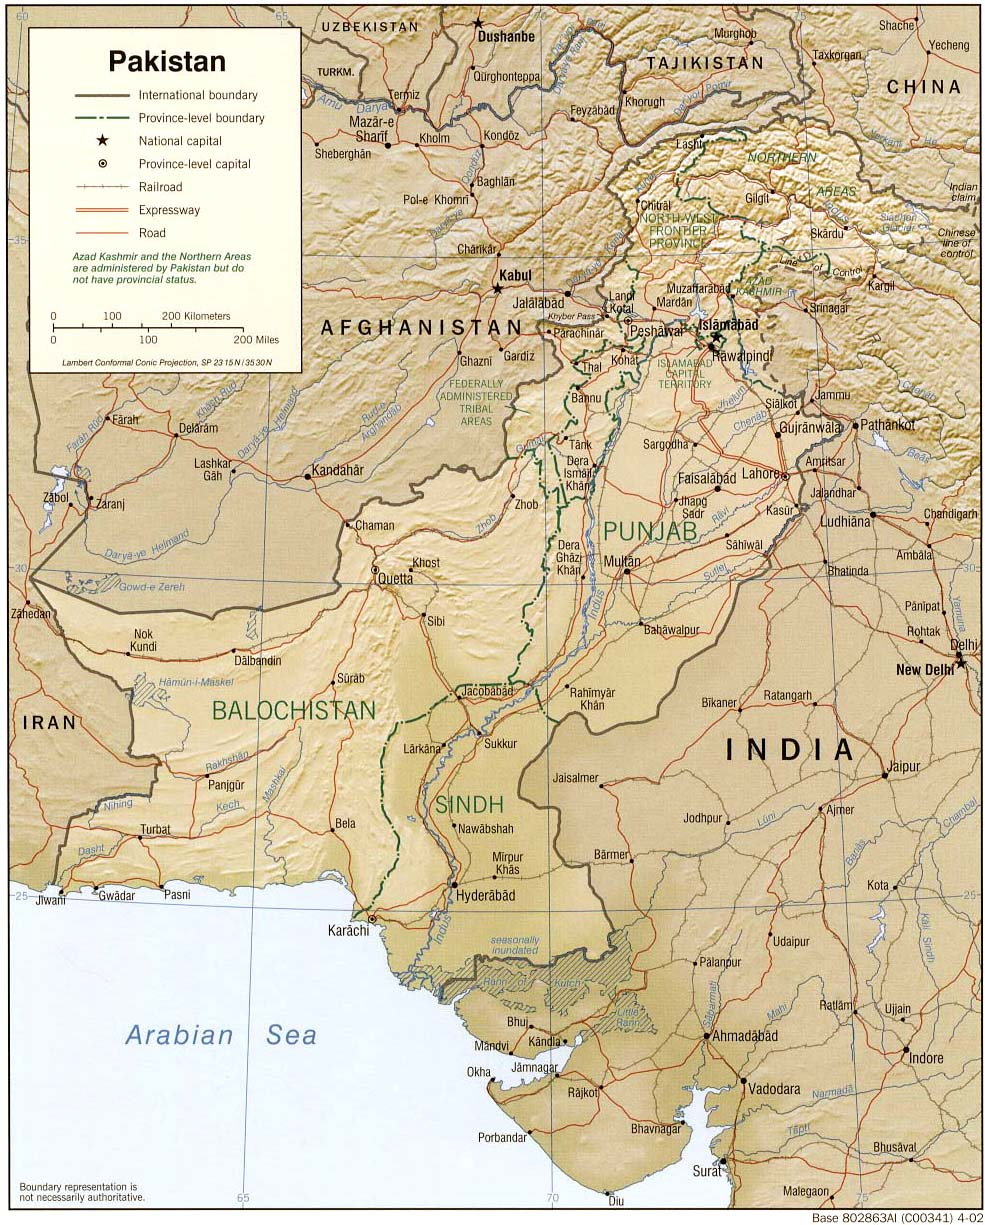 natural resources in pakistan Asslam,o alaikum natural resources of pakistan urdu / hindi bazahir chota sa wajood rekhnay walay pakistan k andhar allah pak ne kya kuch samoya hai is video.